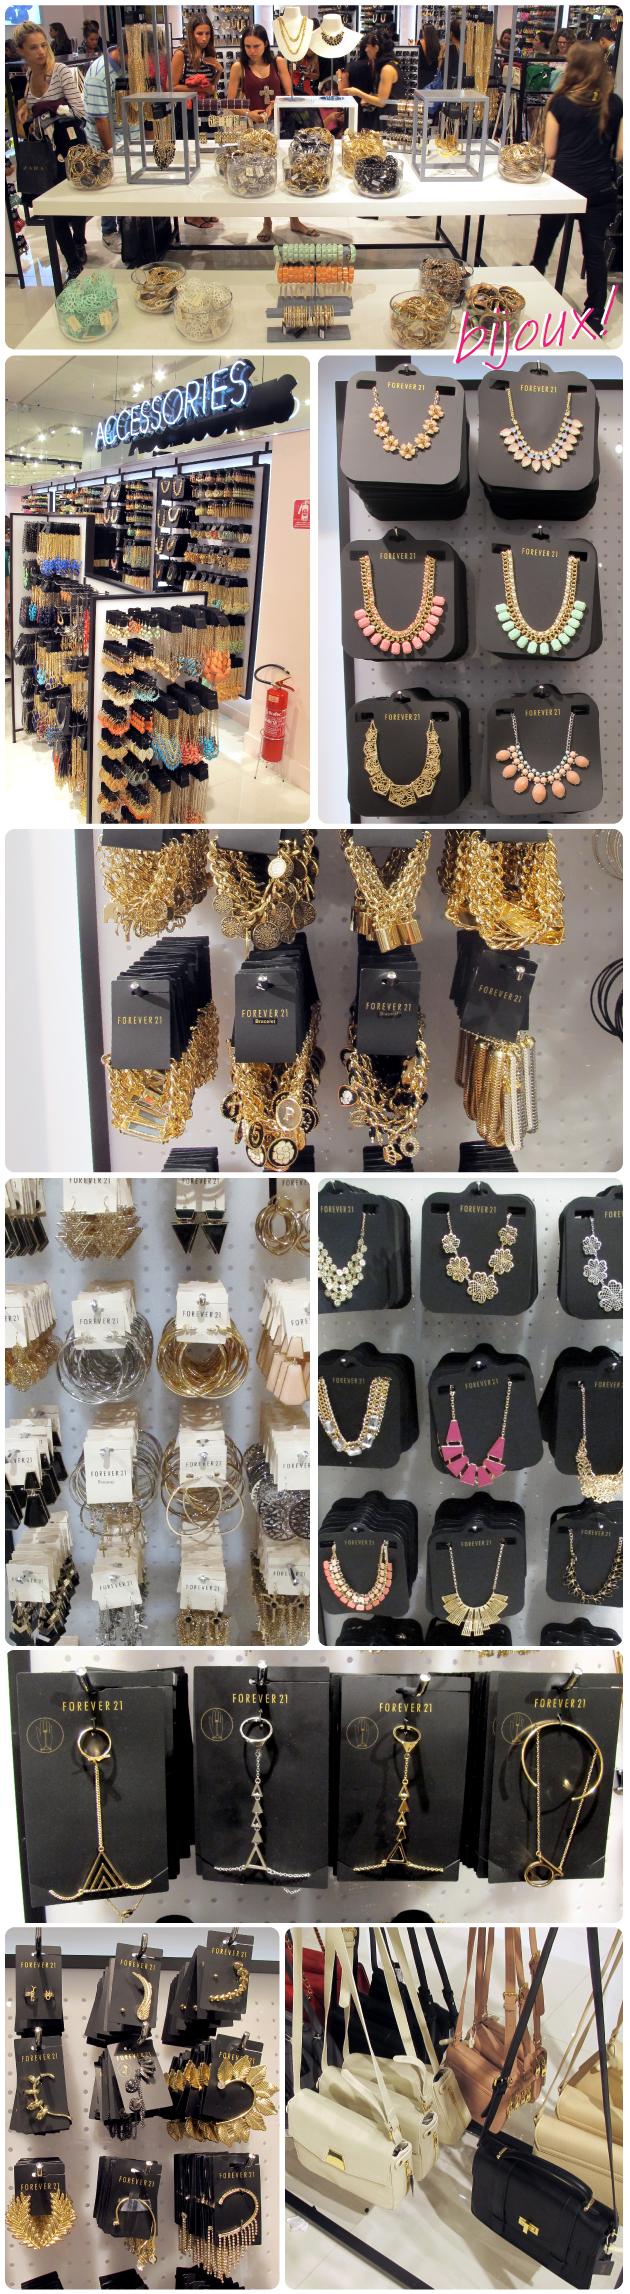 forever-21-village-mall-rio-de-janeiro-brasil-F21-fotos-bijoux-acessorios-colares-pulseiras-brincos-earcuff--